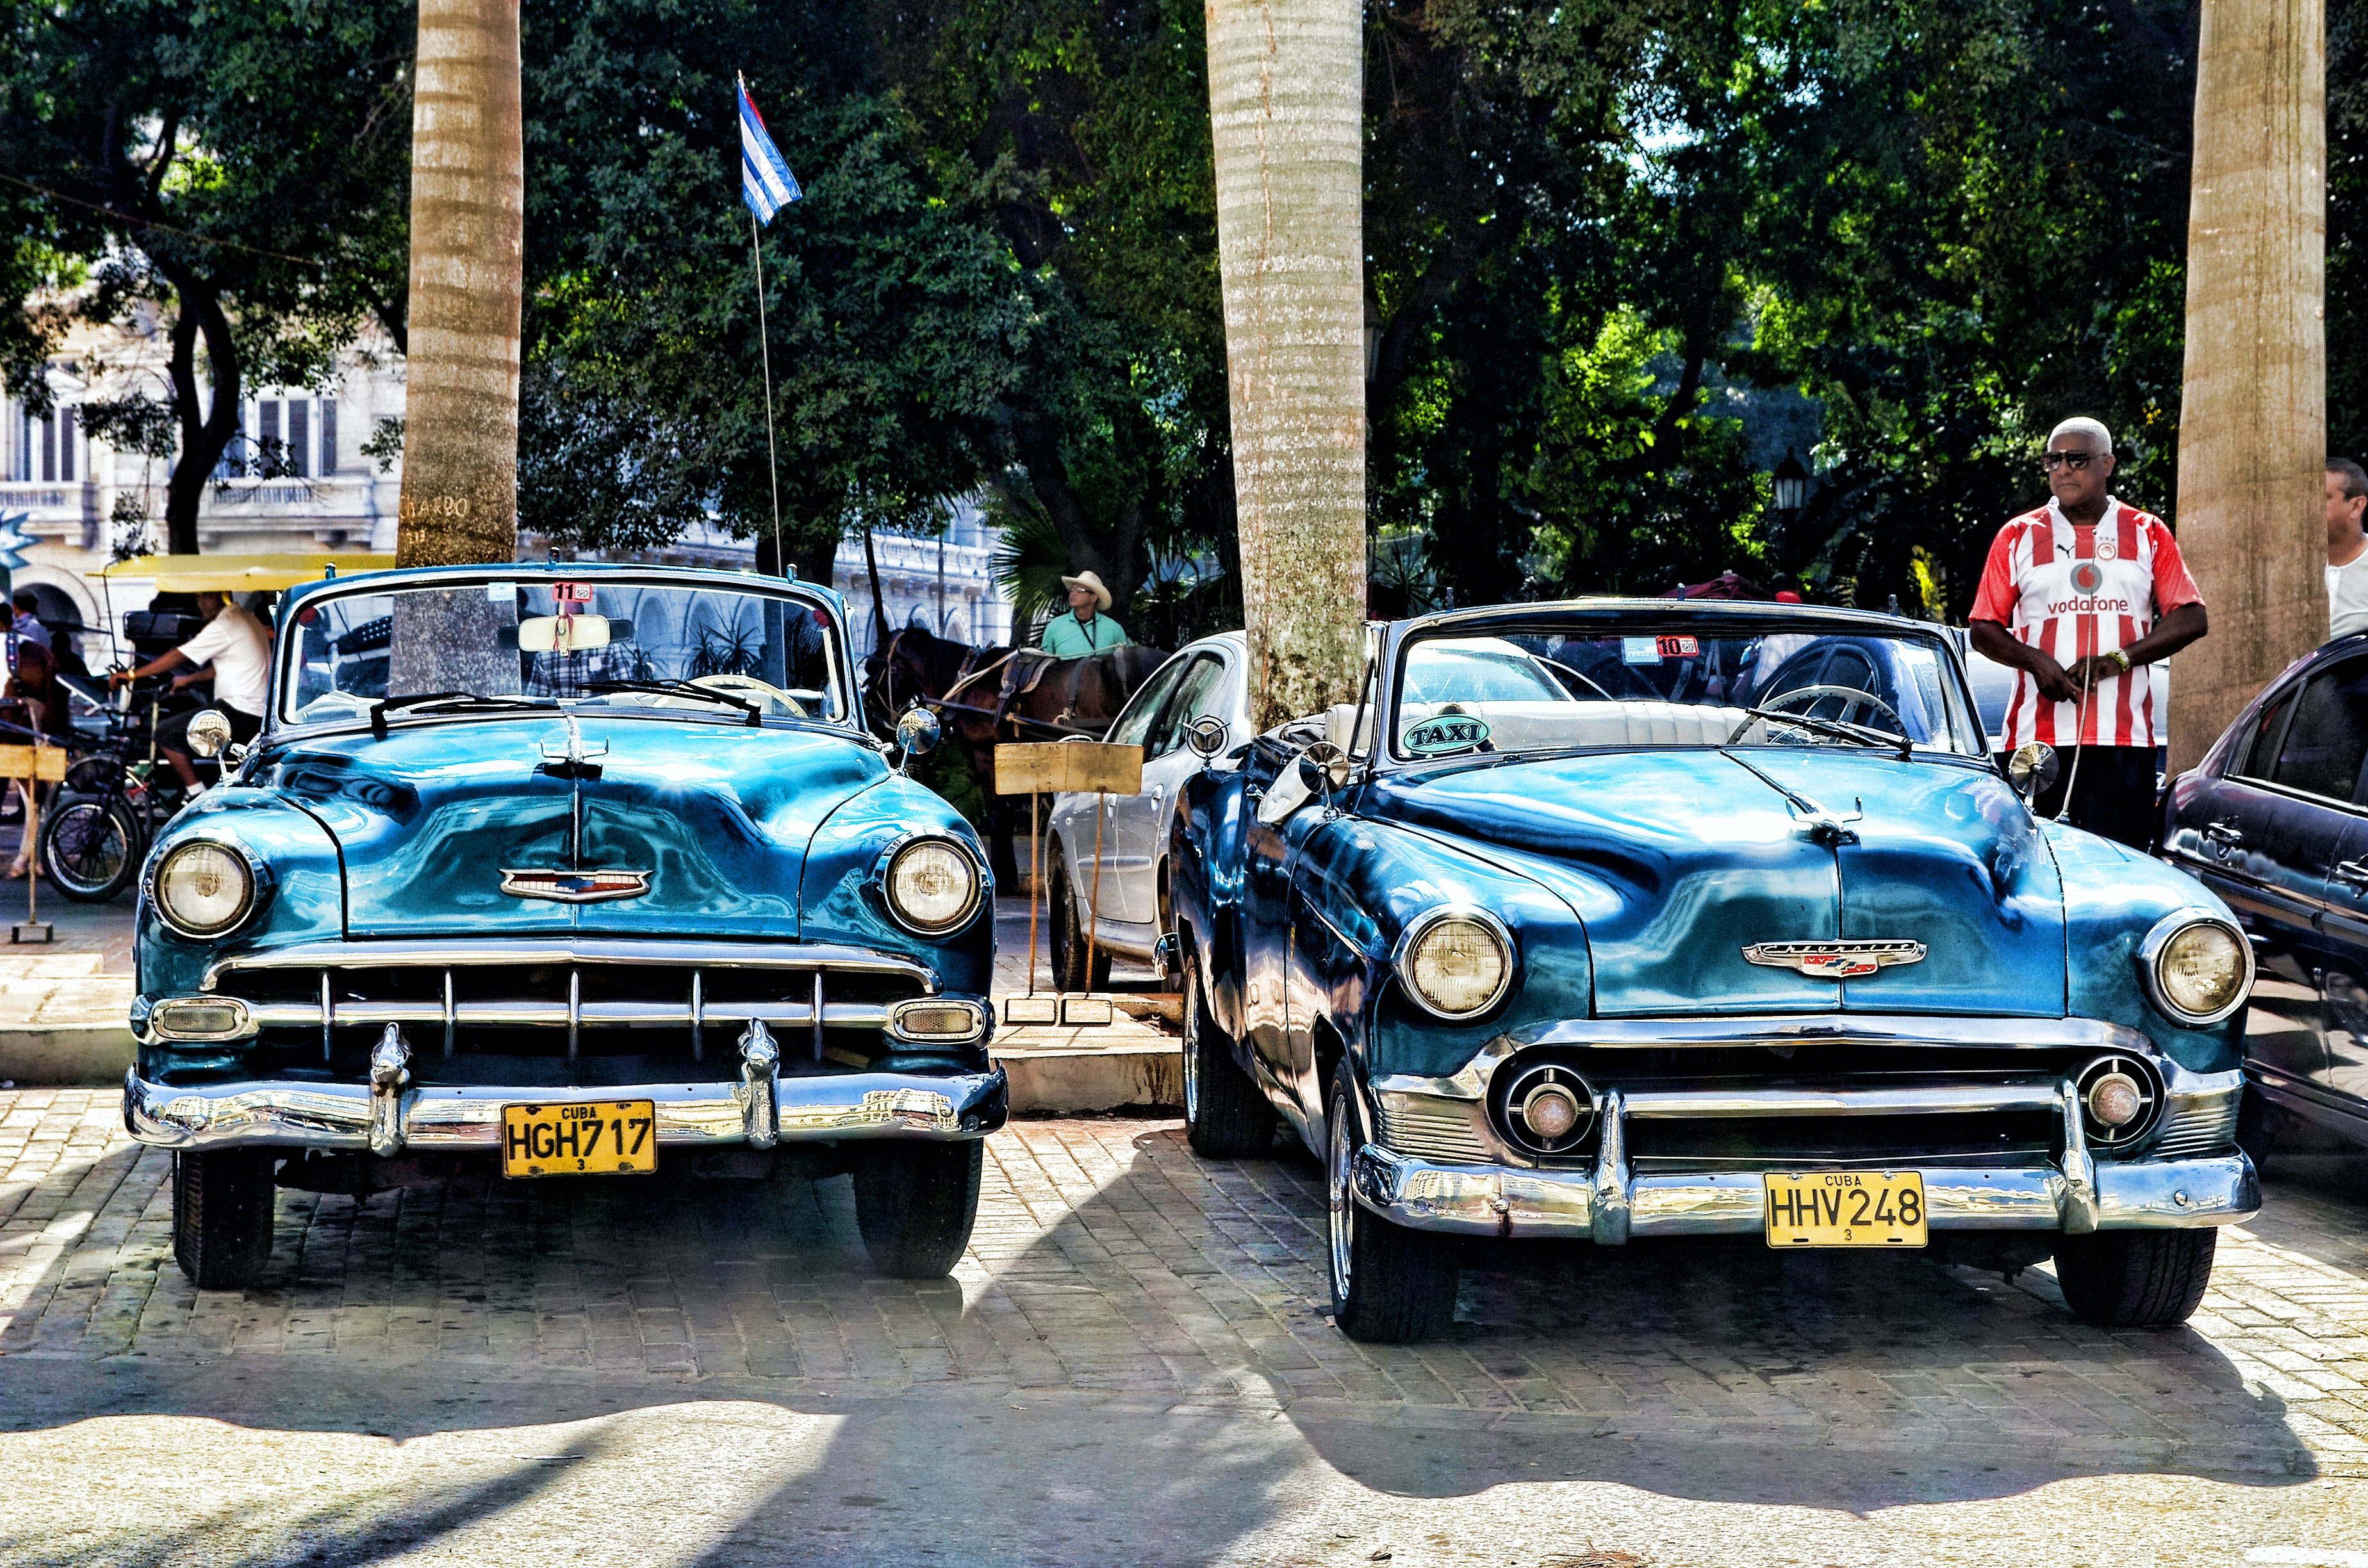 Blue Convertible Vintage Car Parked during Daytime